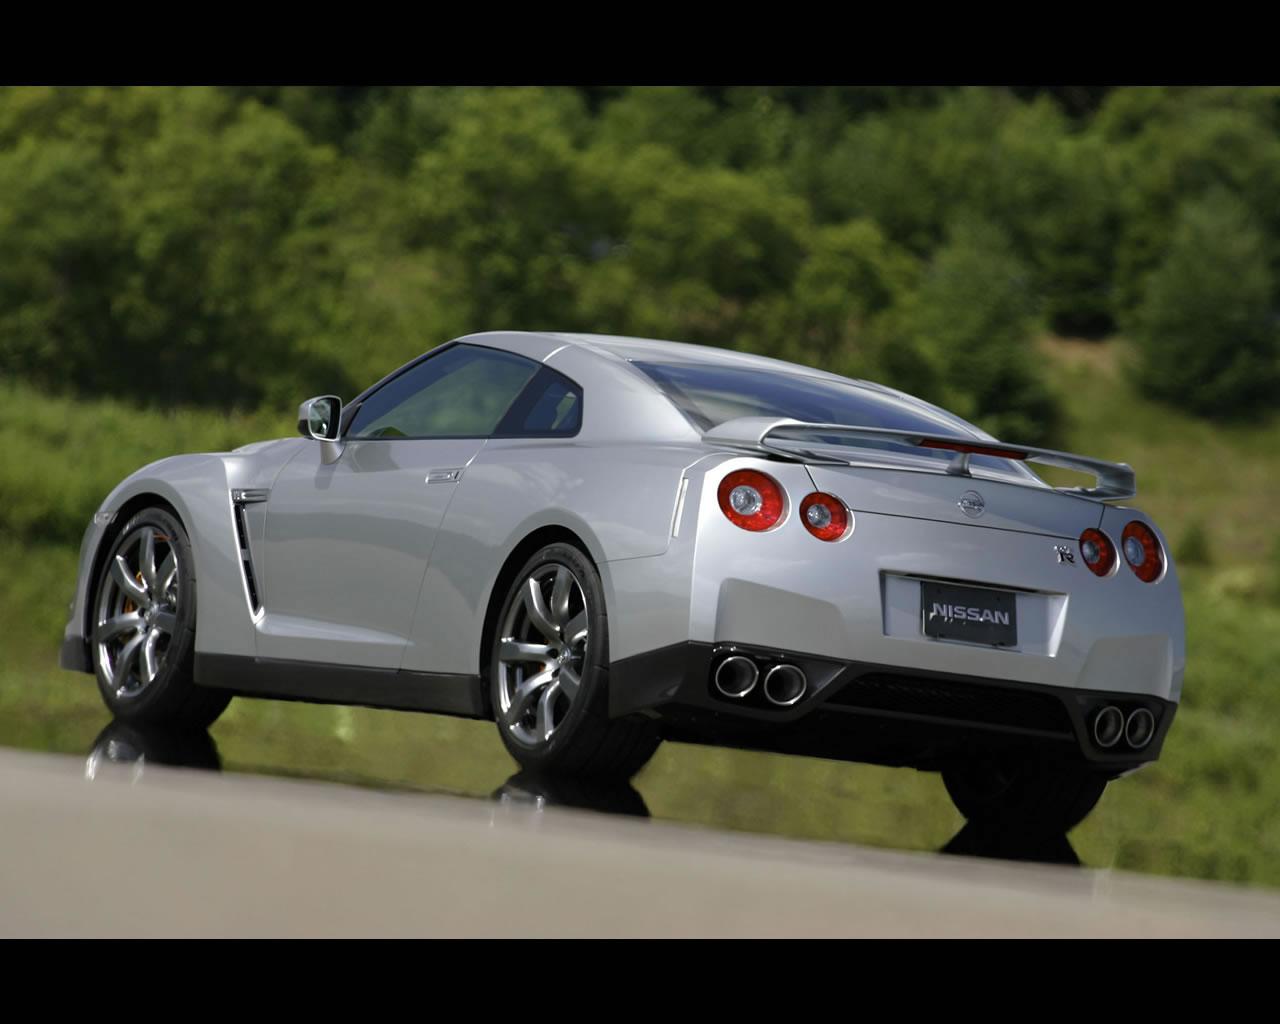 Skyline Gtr Nissan >> Nissan GTR / Nissan GTR 3_jpg.jpg